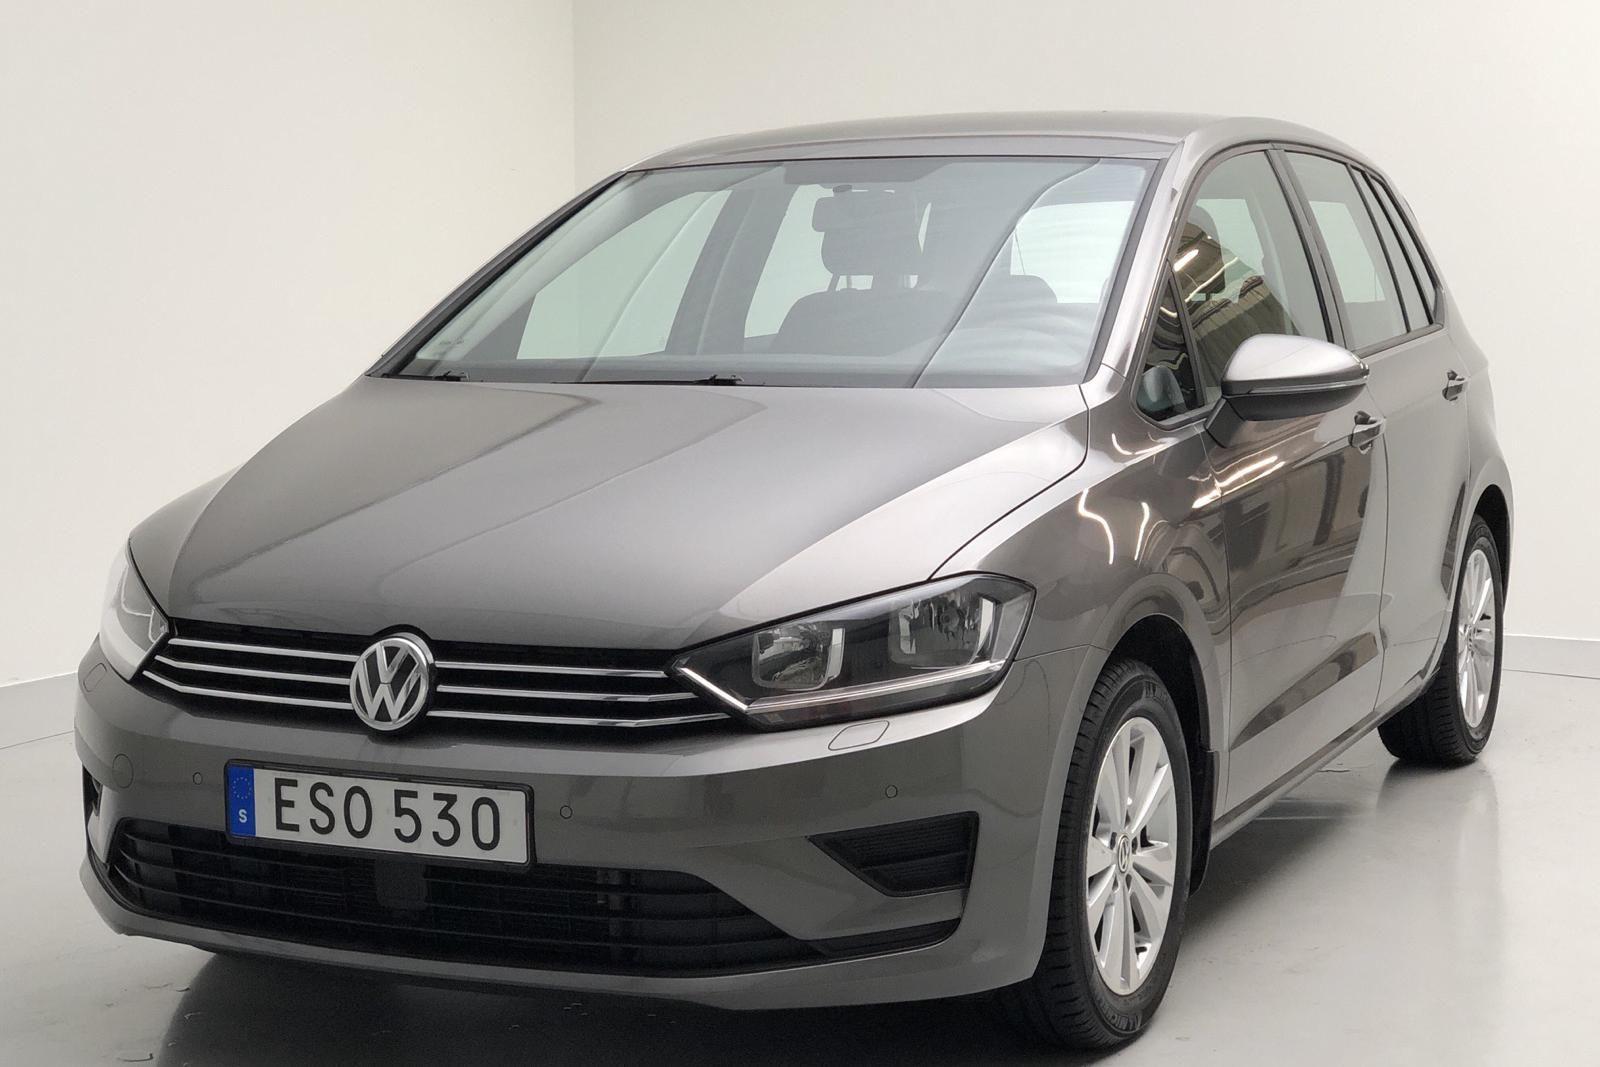 VW Golf VII 1.6 TDI BlueMotion Technologie Sportsvan (110hk)